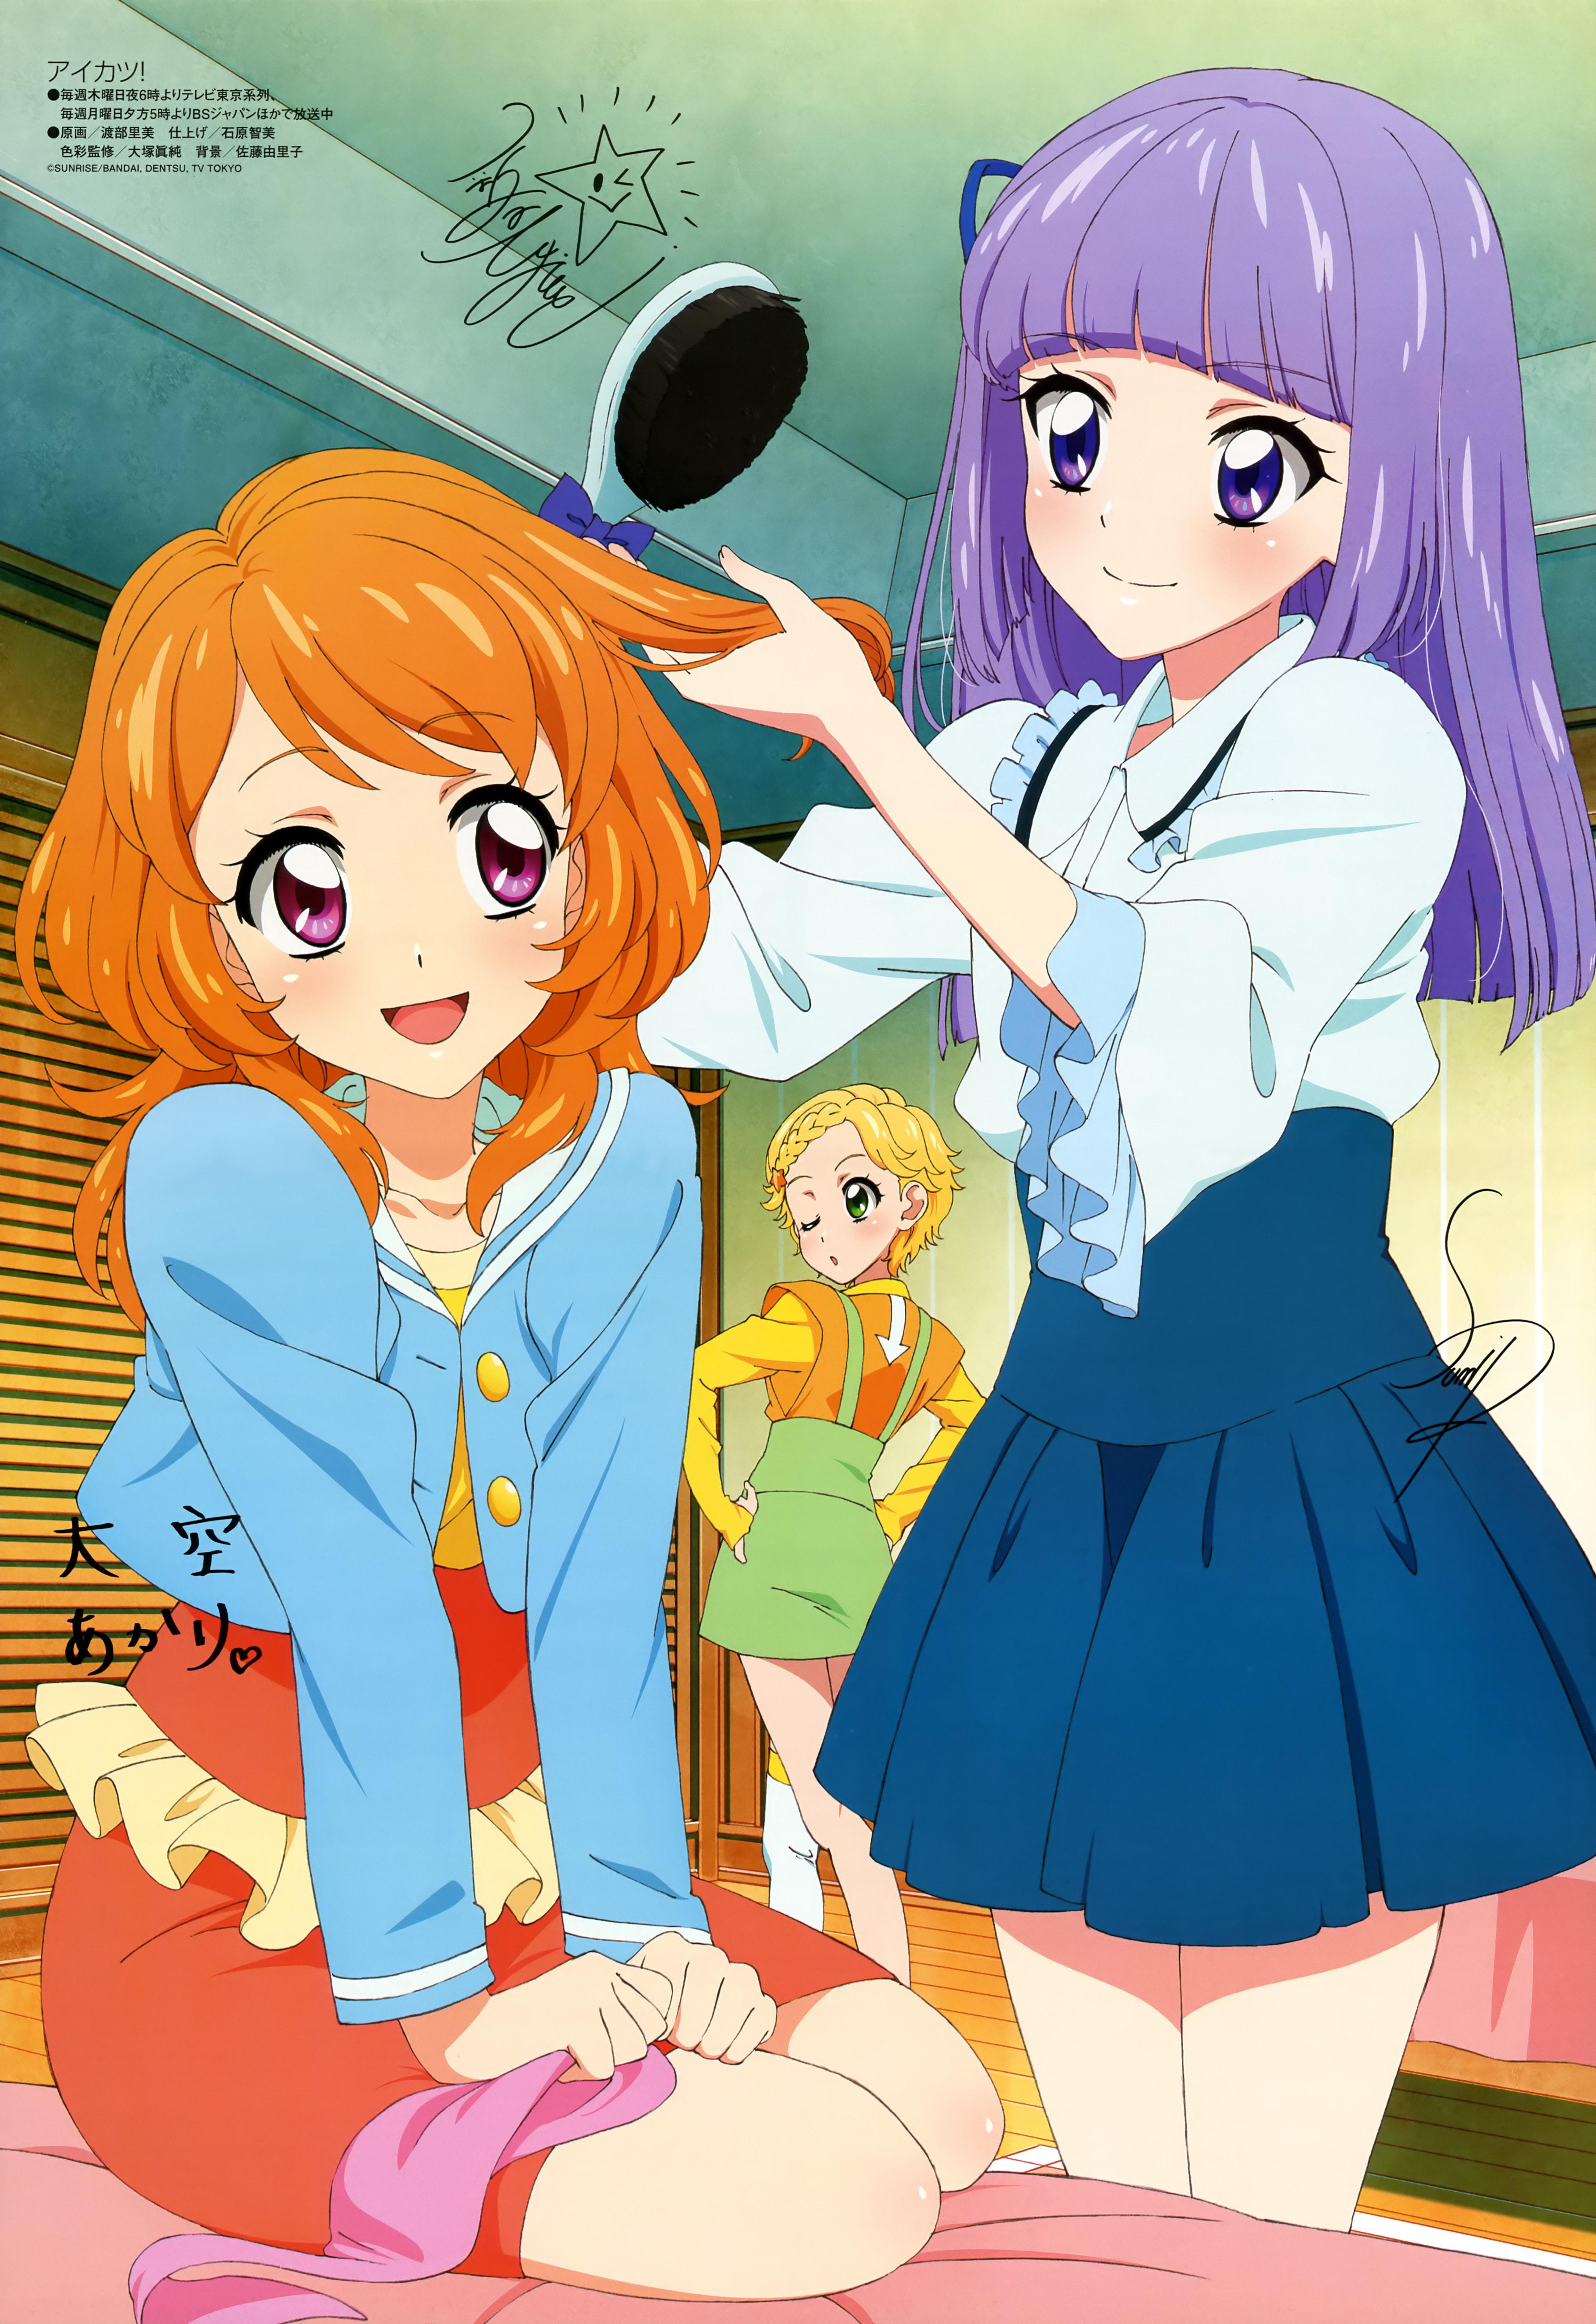 Aikatsu! | page 3 of 164 - Zerochan Anime Image Board